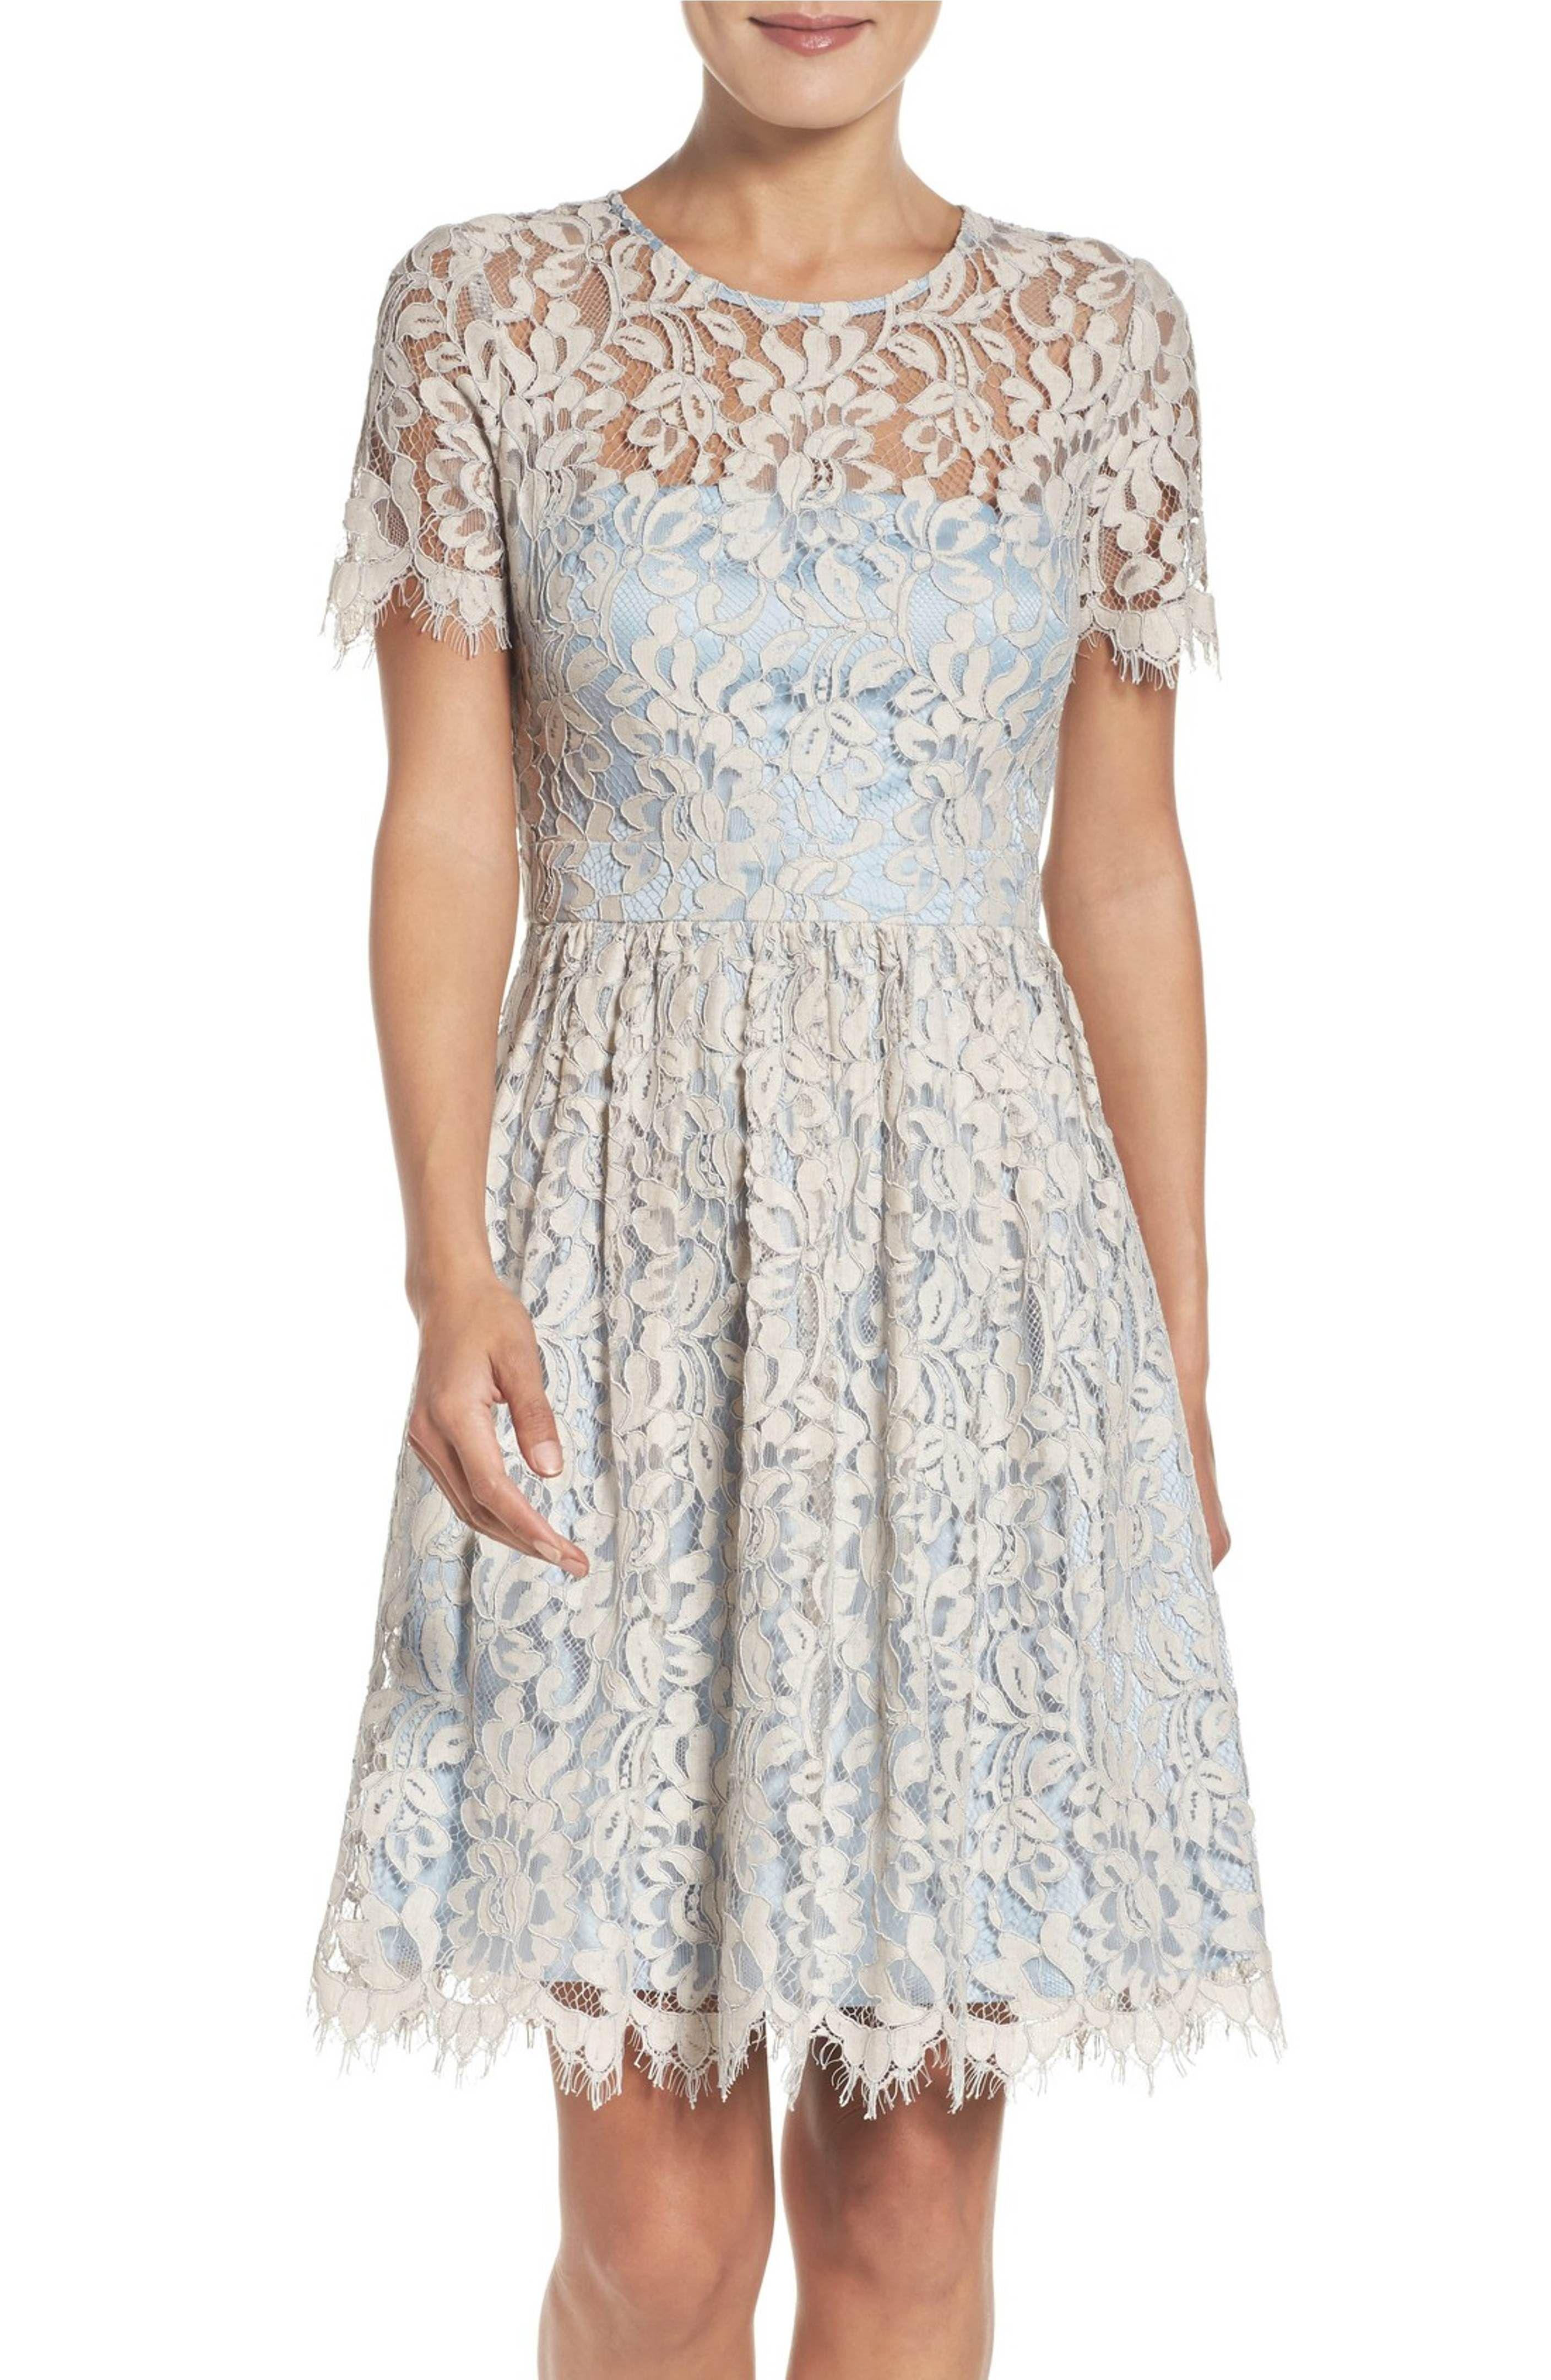 82341787a37 Main Image - Eliza J Lace Fit & Flare Dress (Regular & Petite ...